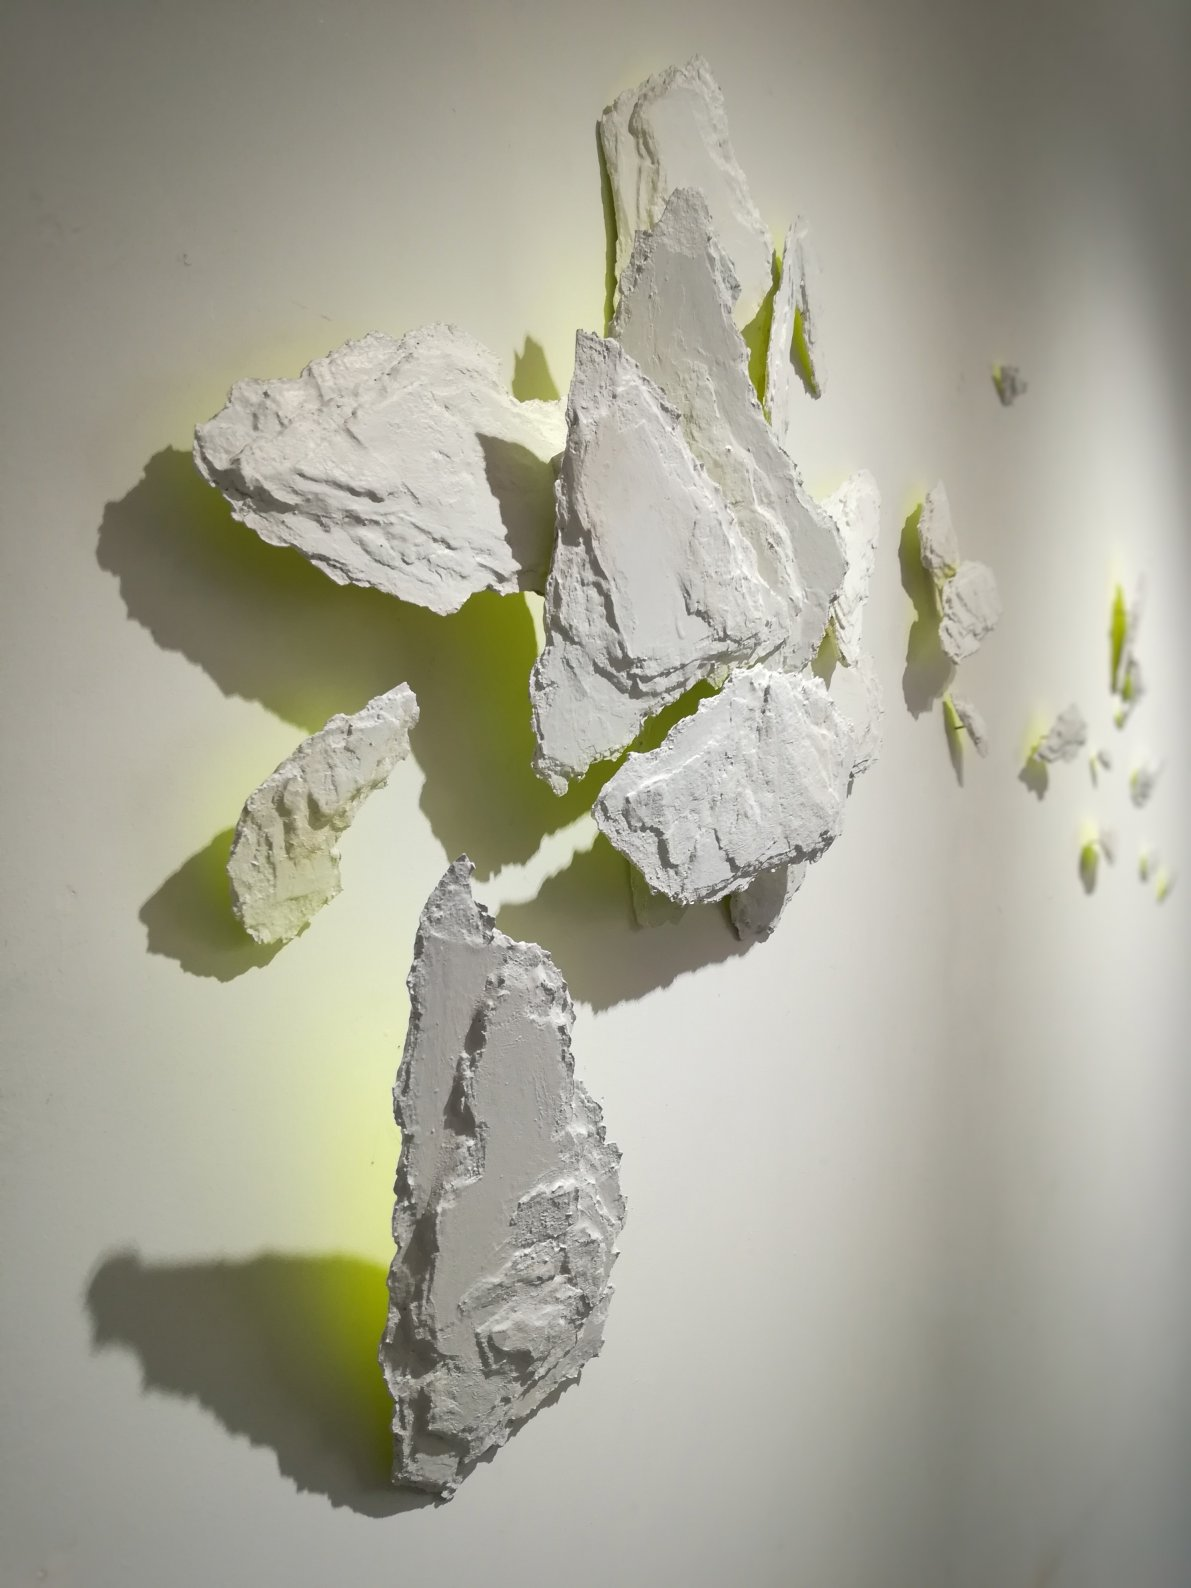 METEOROS (2018) - Cristina Almodóvar